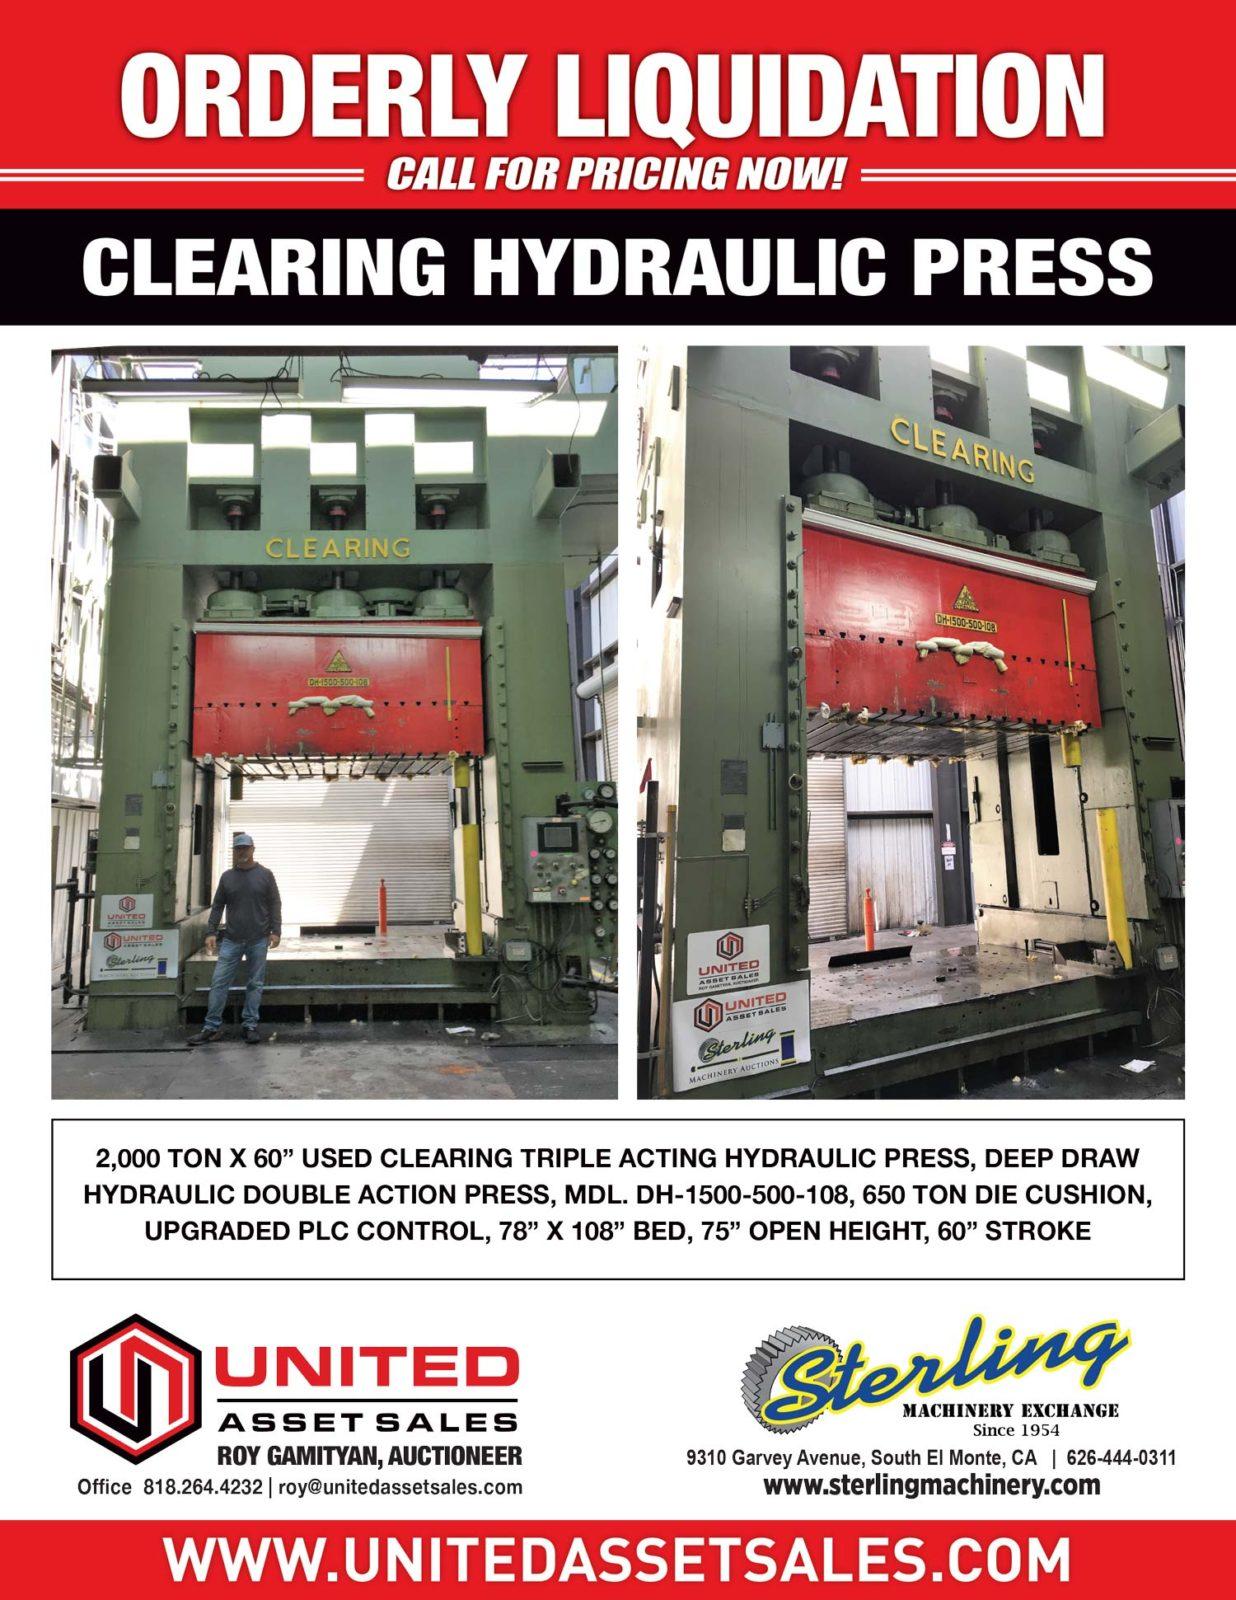 United Asset Sales | CNC Machine Shop, Fabrication Equipment